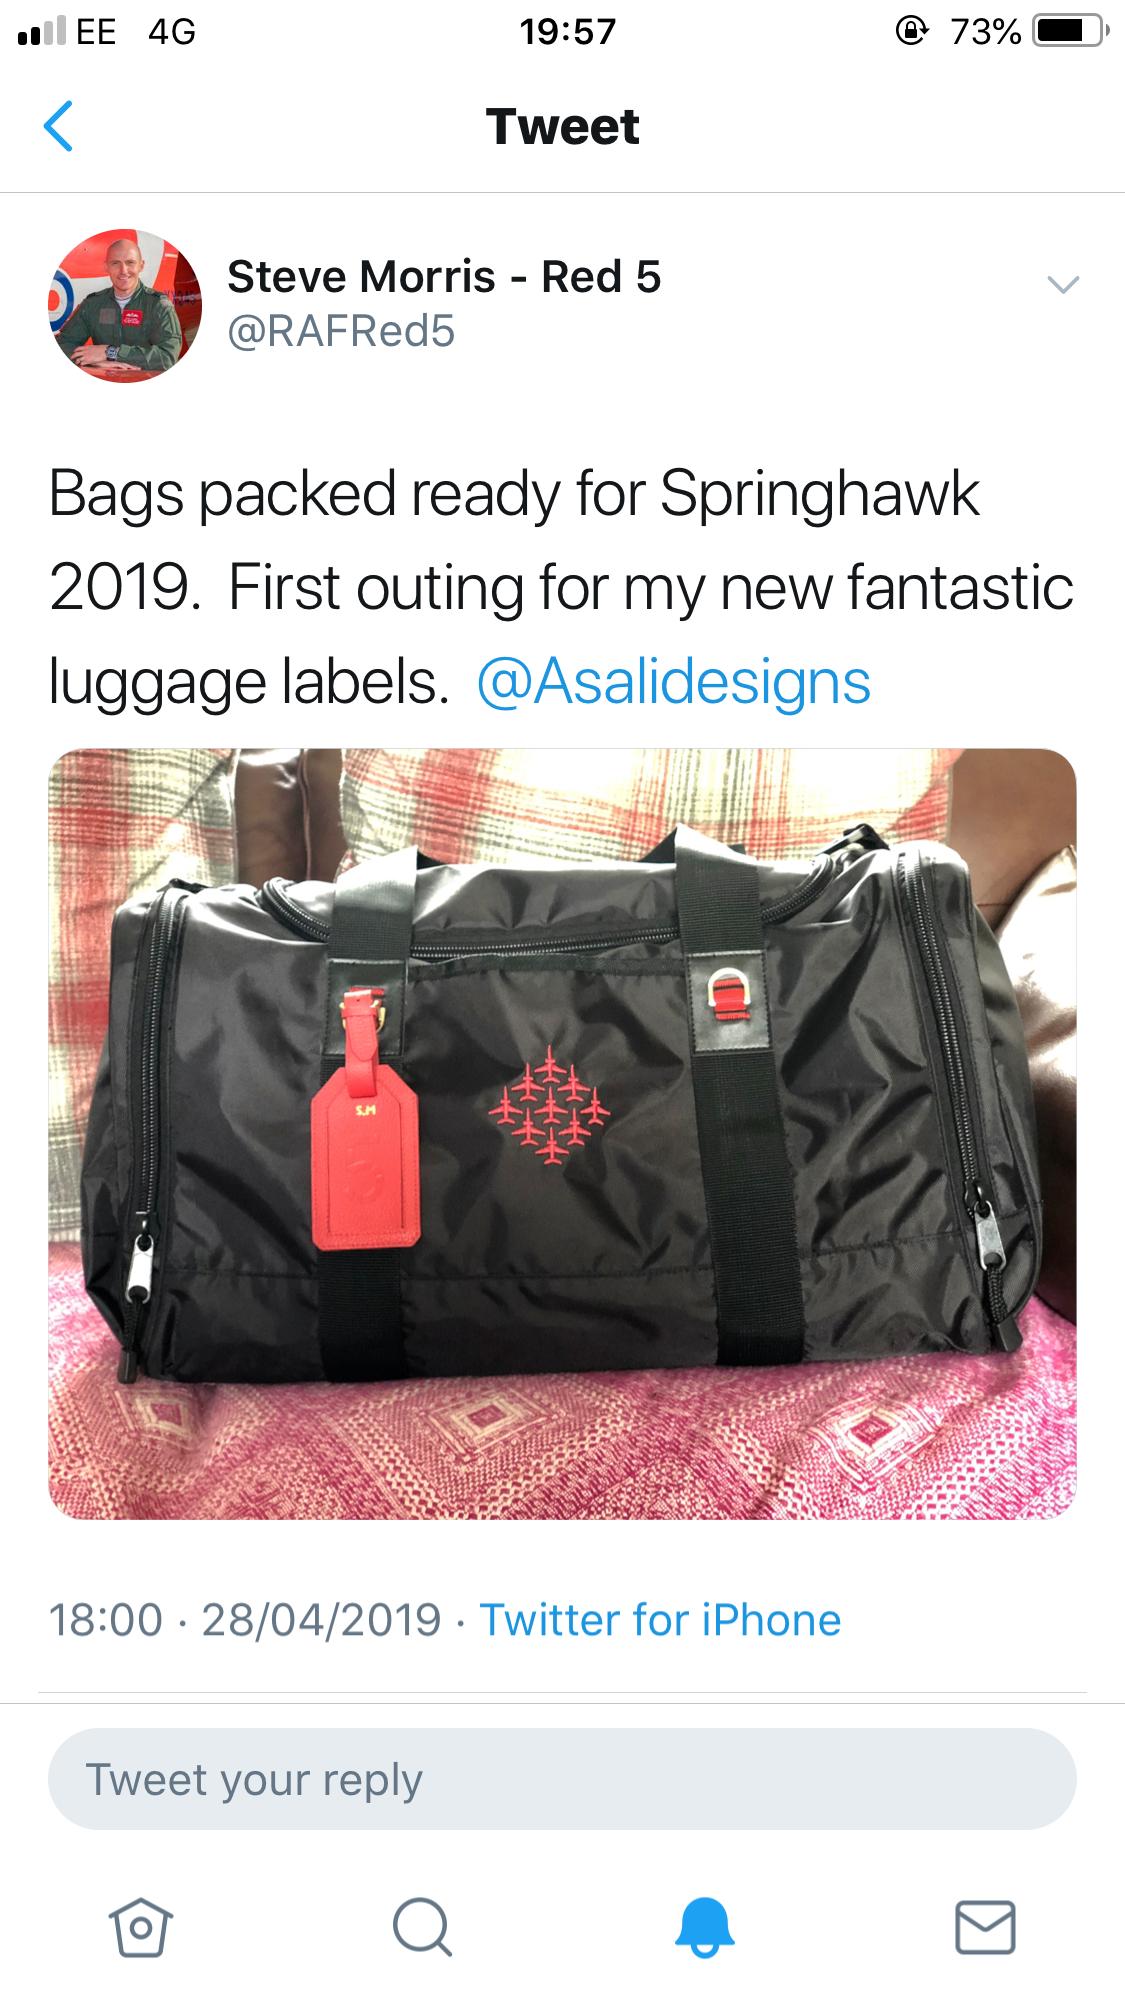 raf red 5 steven morris spring hawk luggage